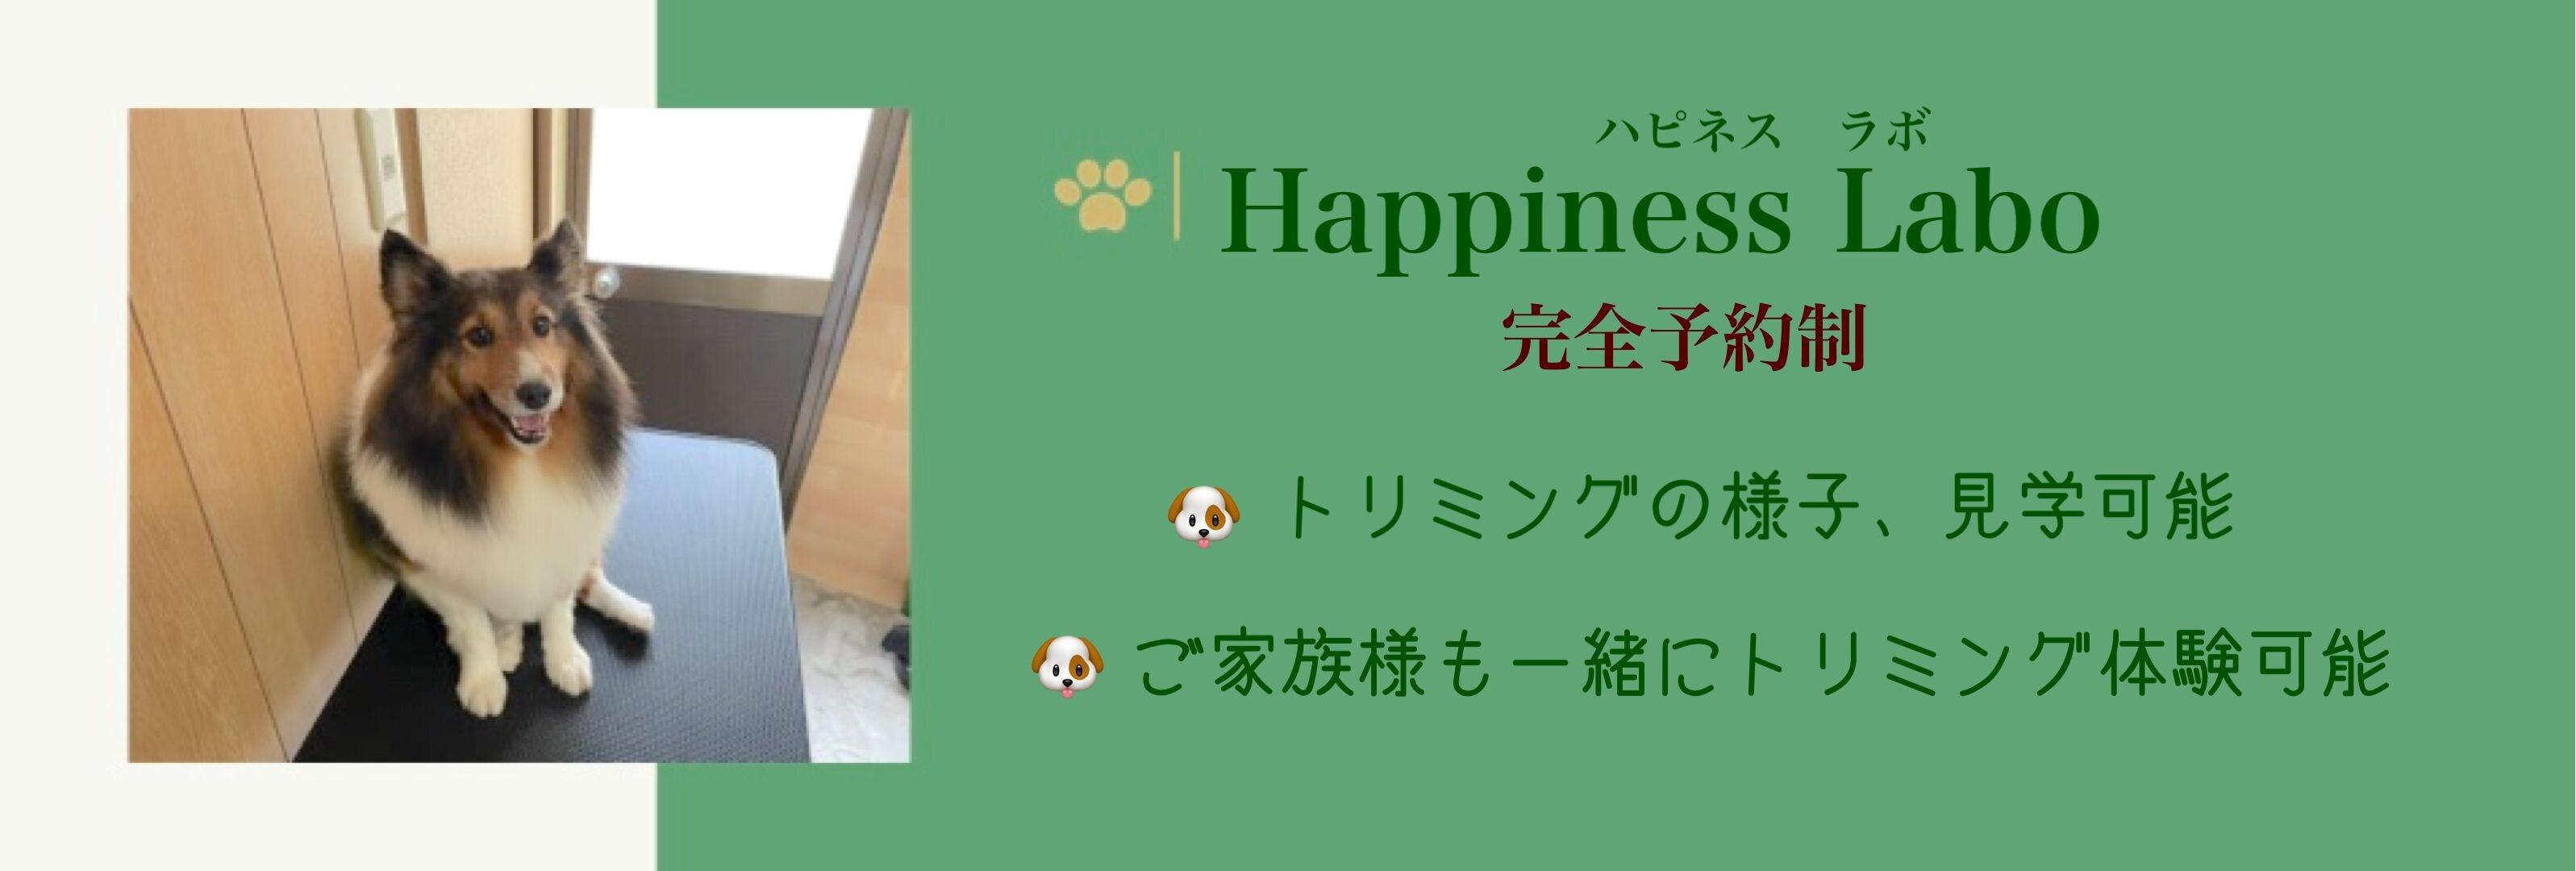 Happiness  Labo(ハピネス ラボ)